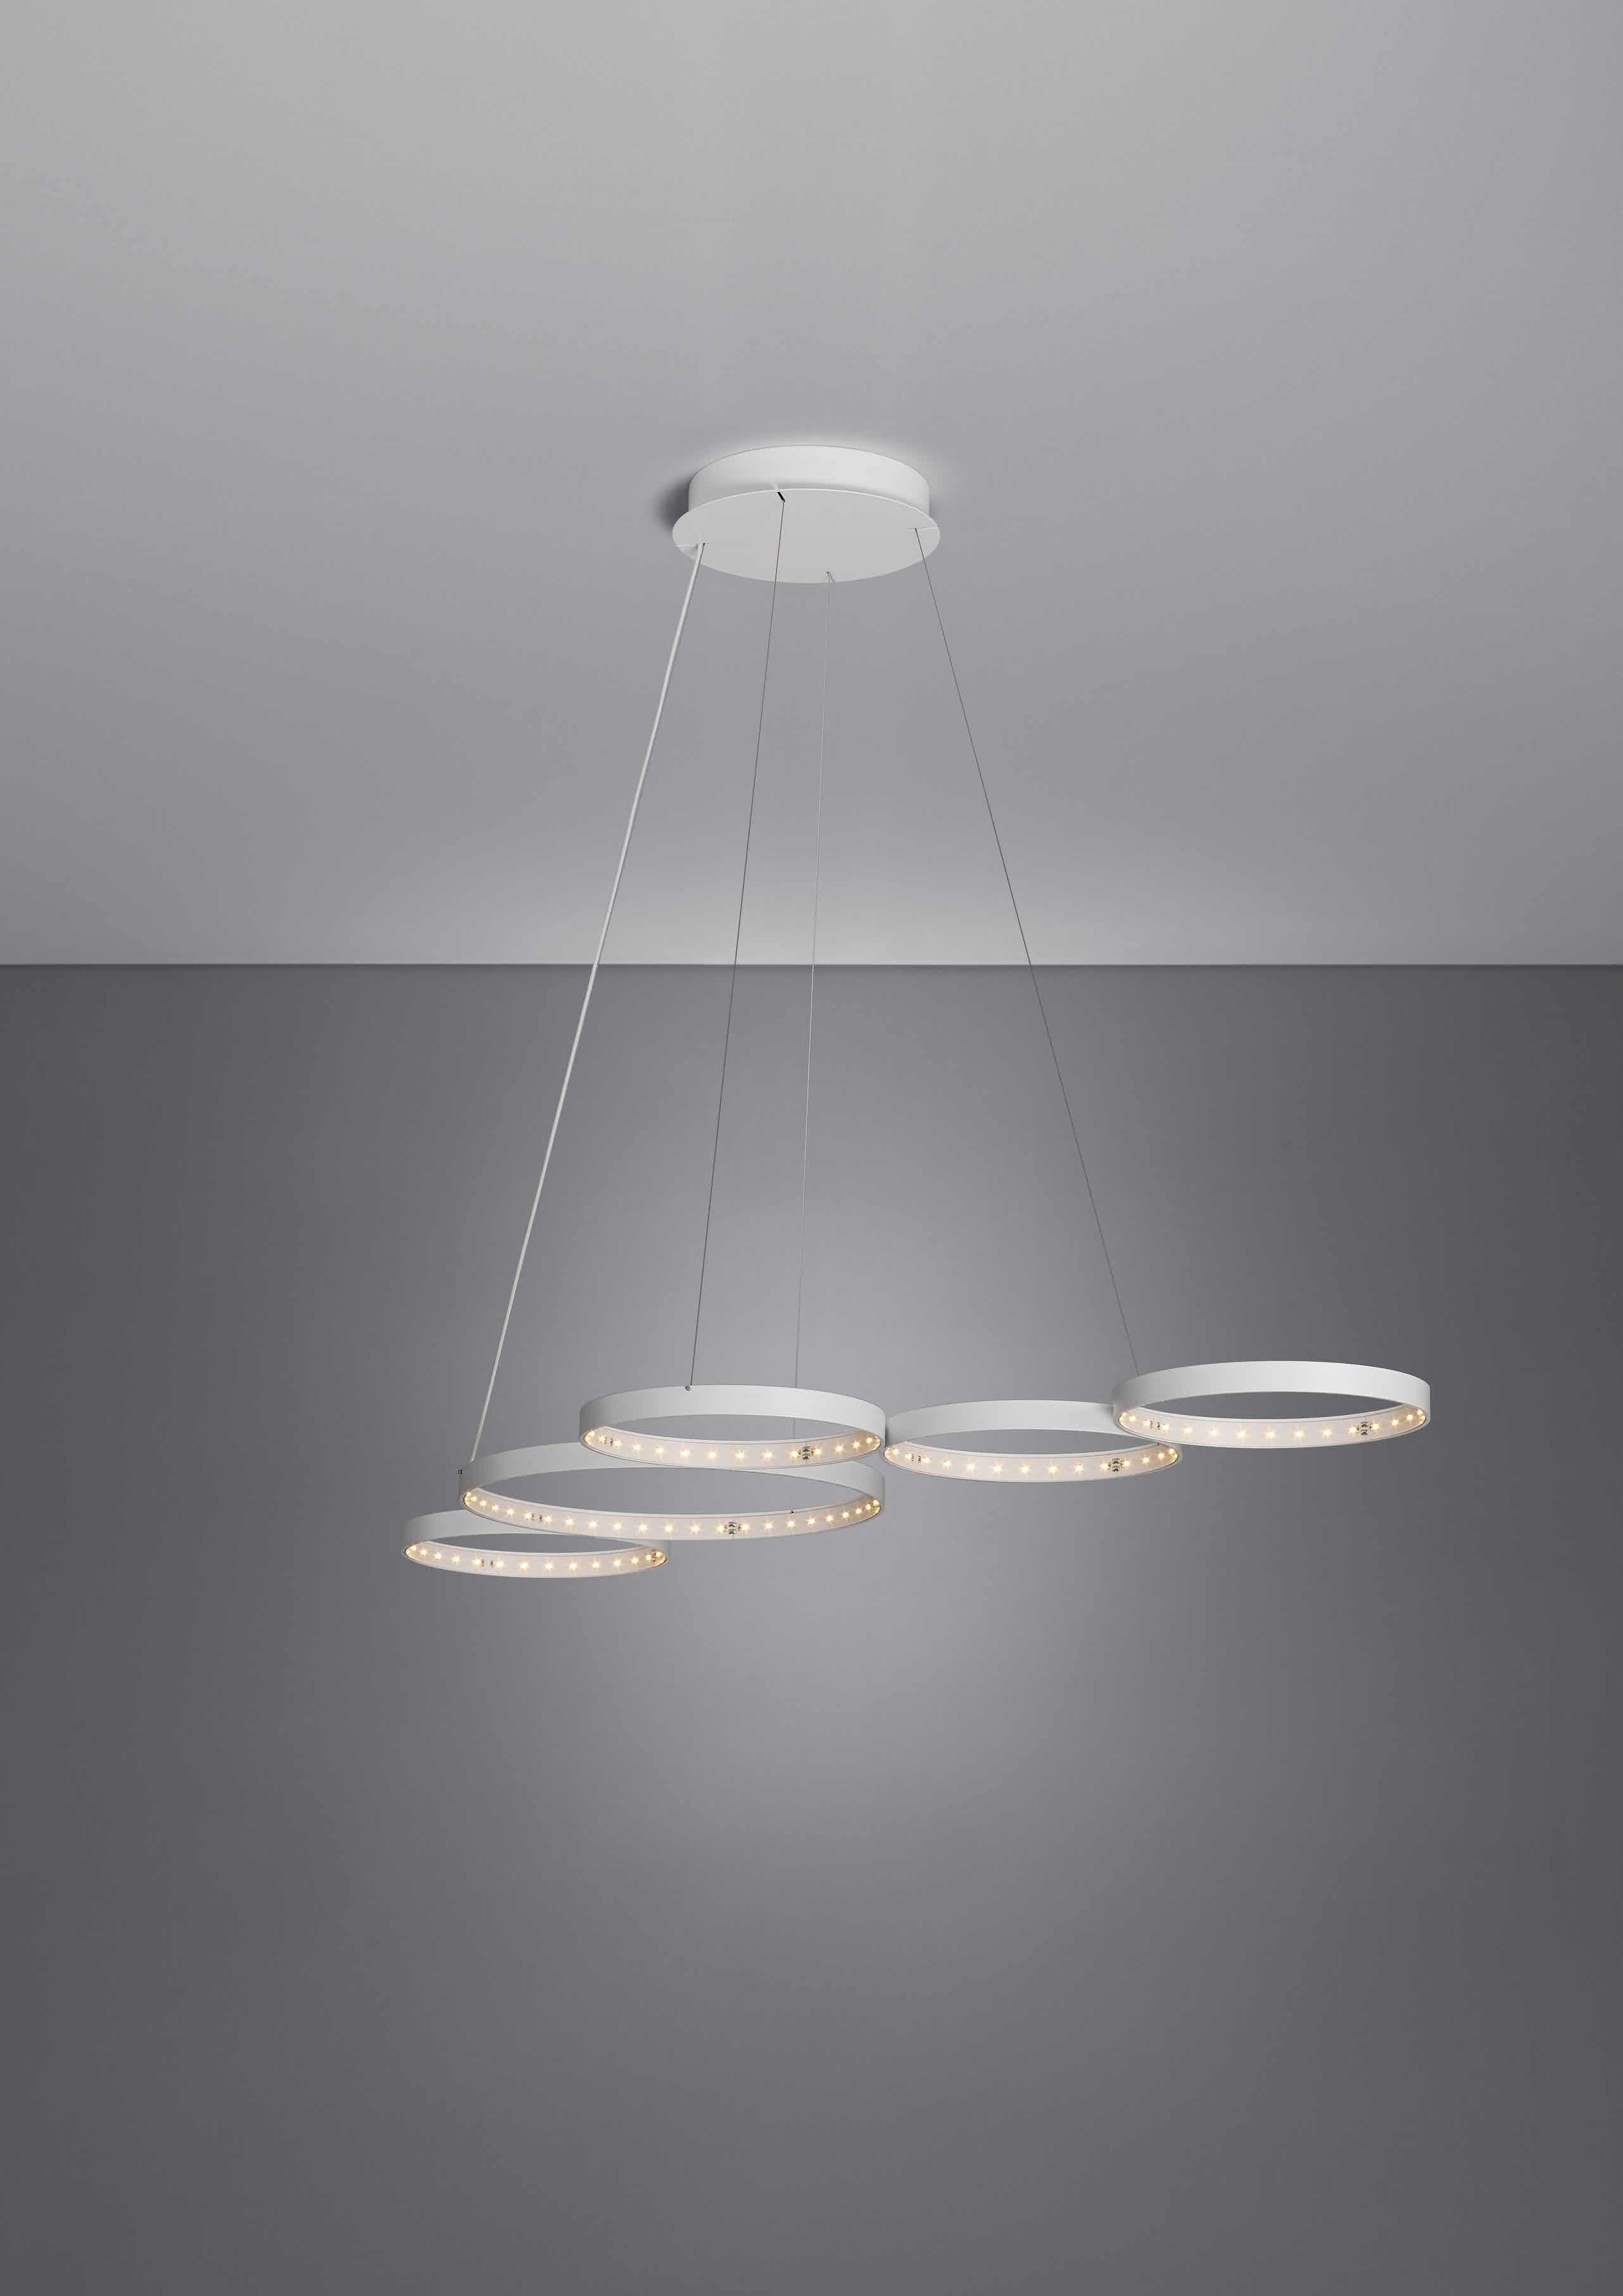 Le-deun-luminaires-super-8-hanging-lamp-white-position-1-haute-living